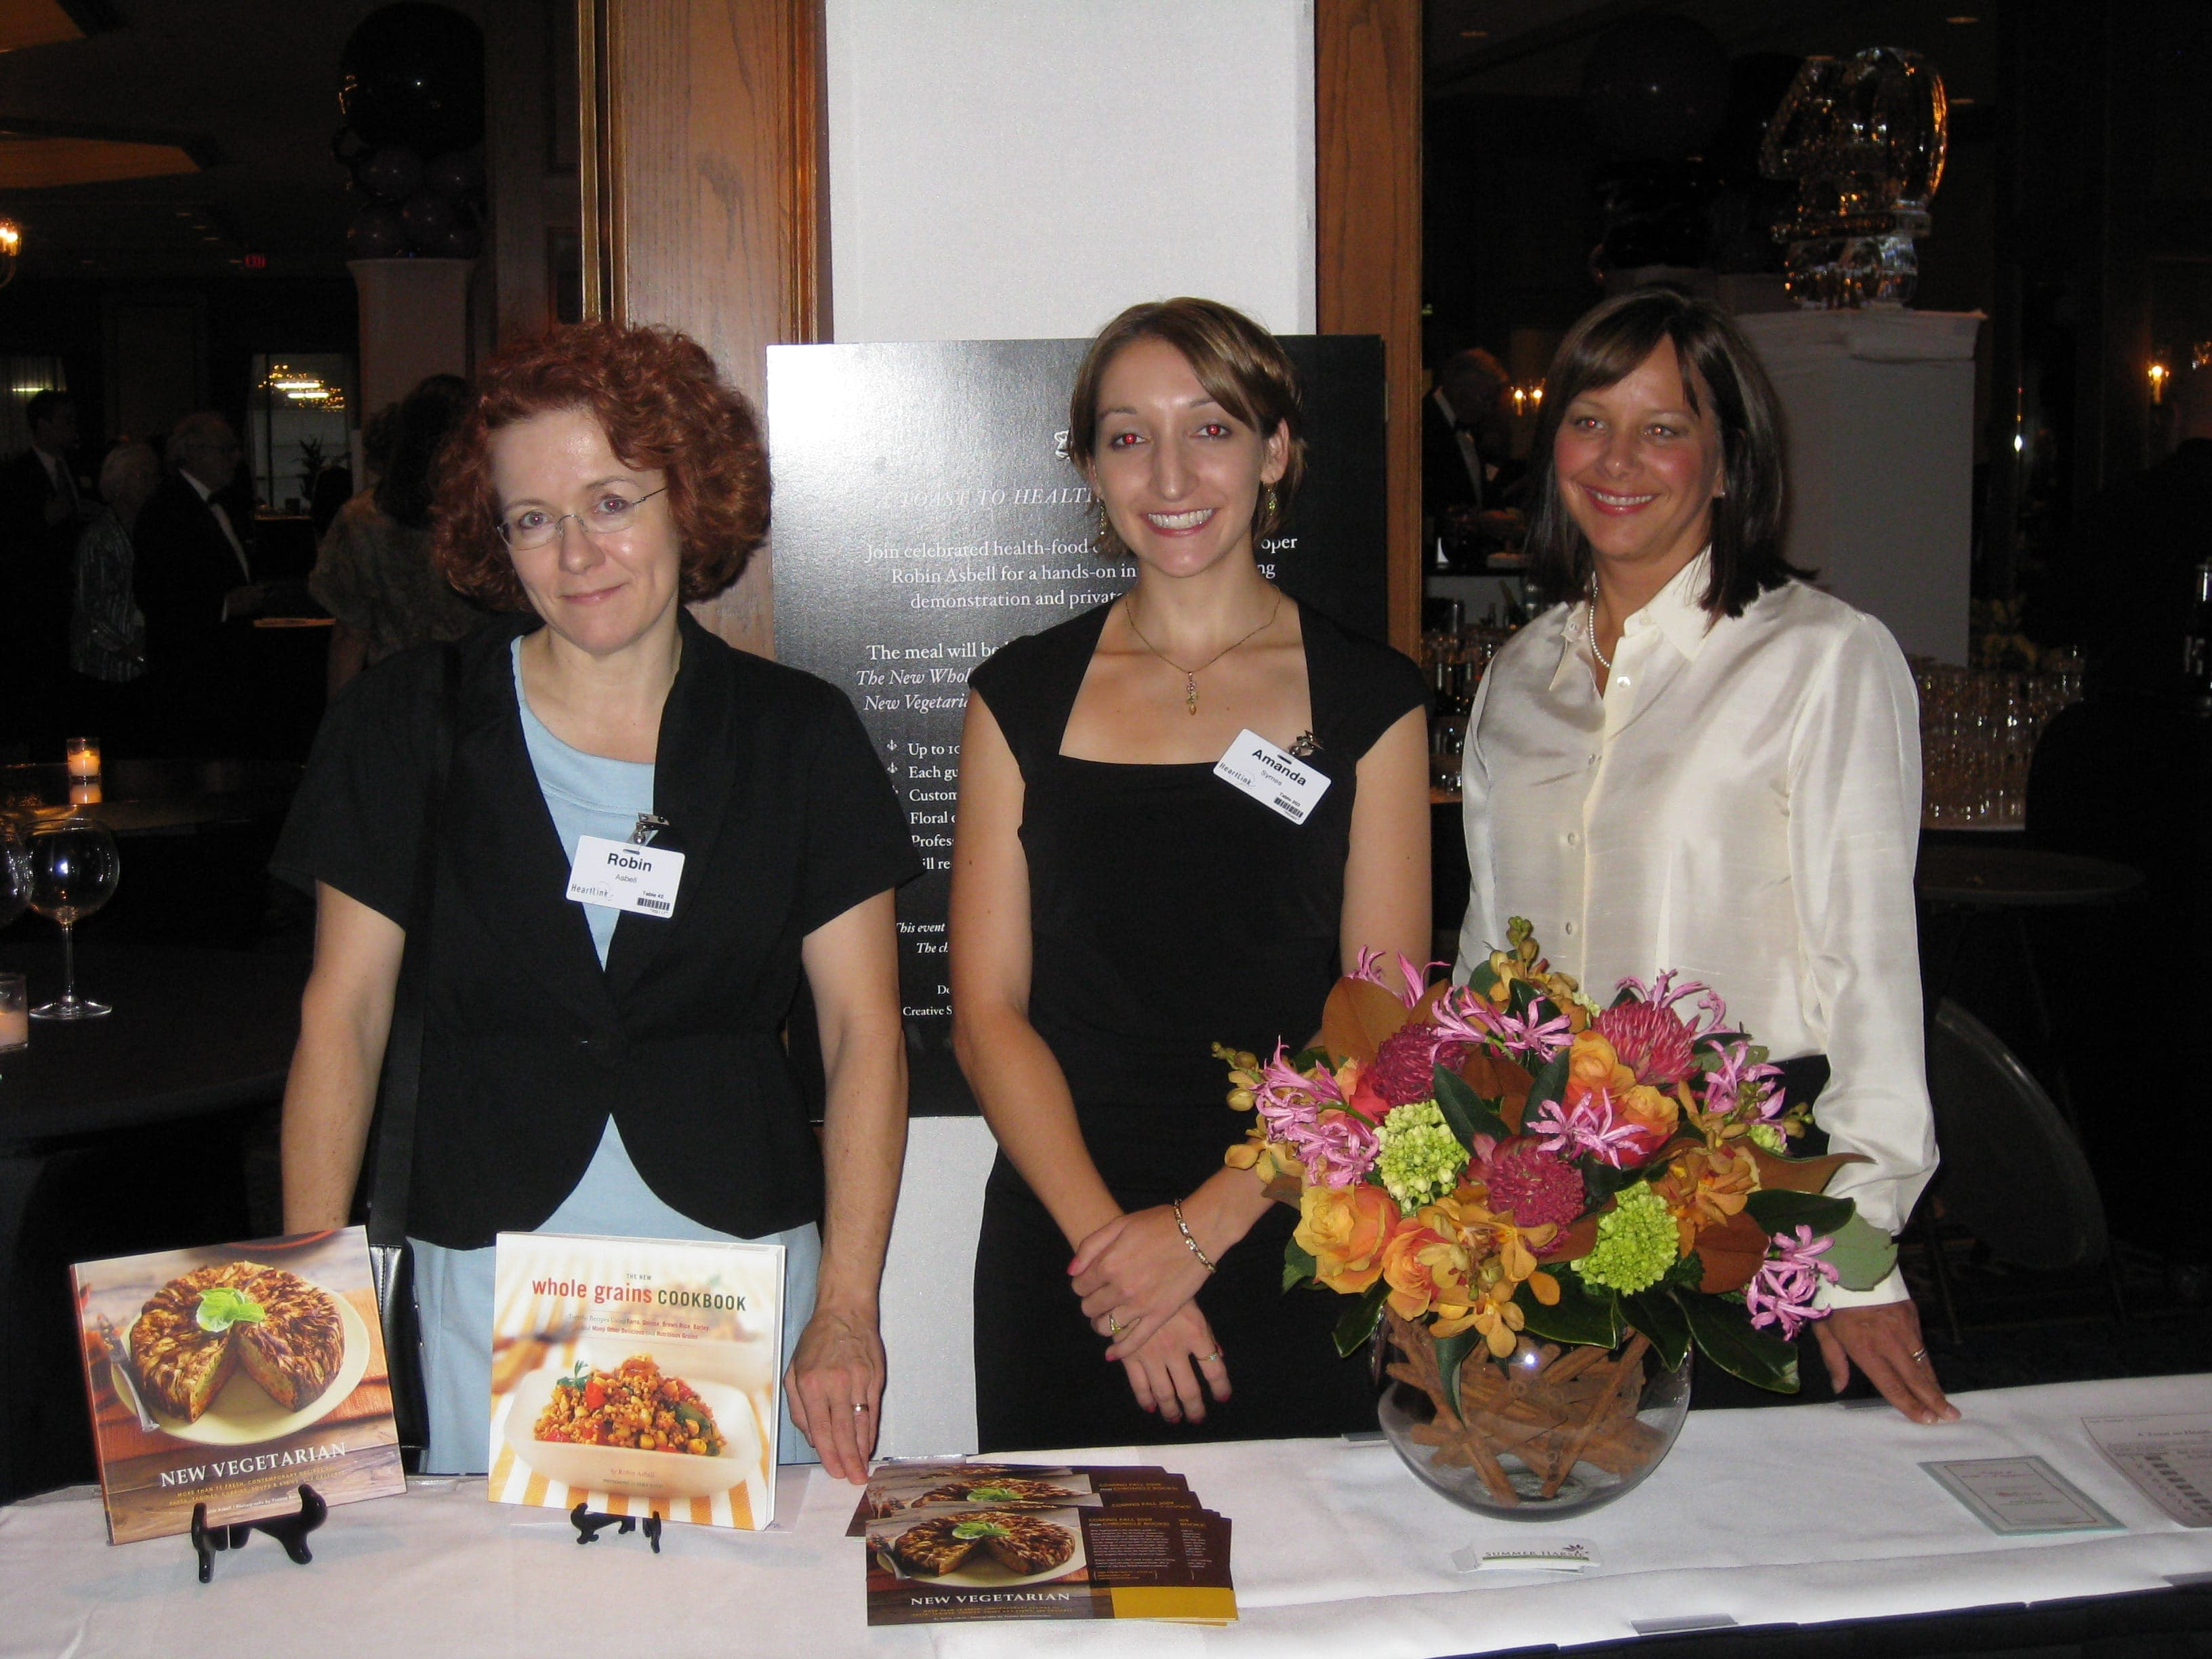 The New Veg Table, Me Amanda and my GF Kris